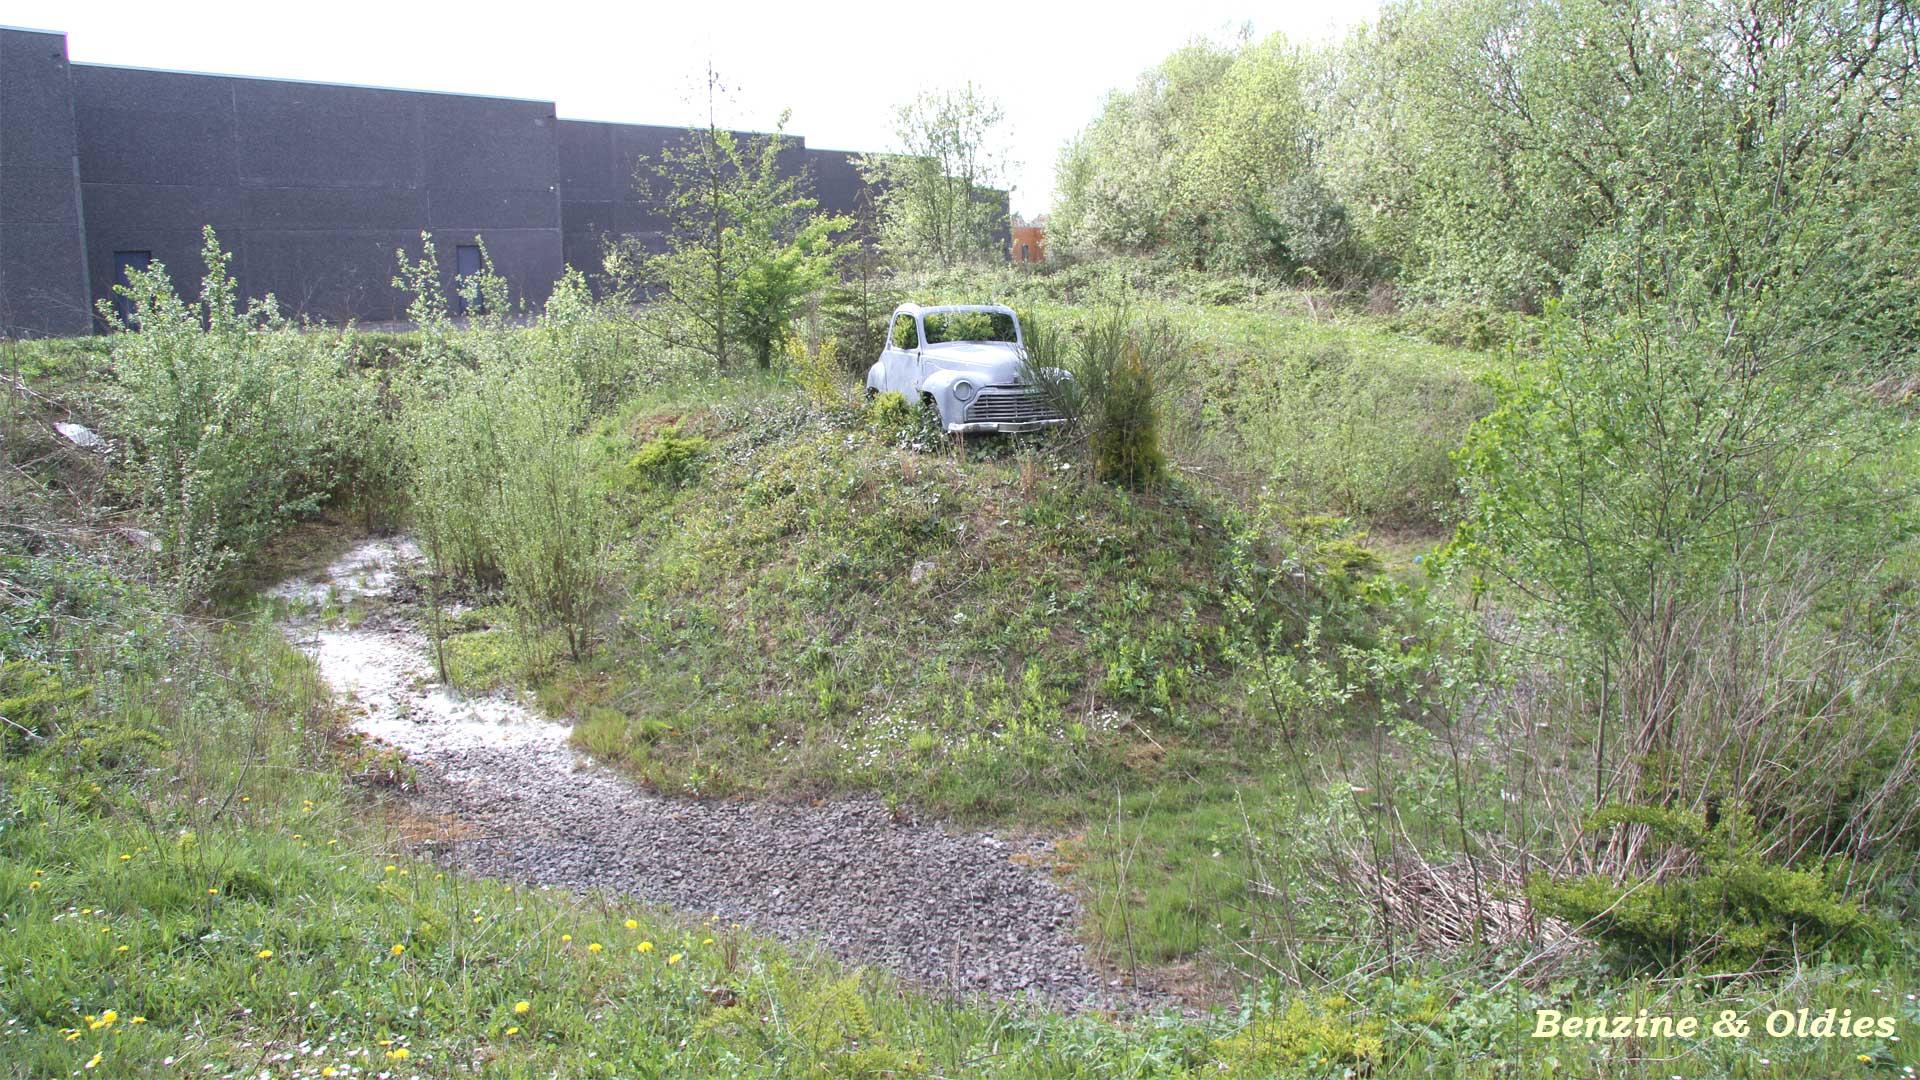 une Simca 6 carrosserie aluminium oubliée dans la nature - Simca6 665328simca6street06w19201080